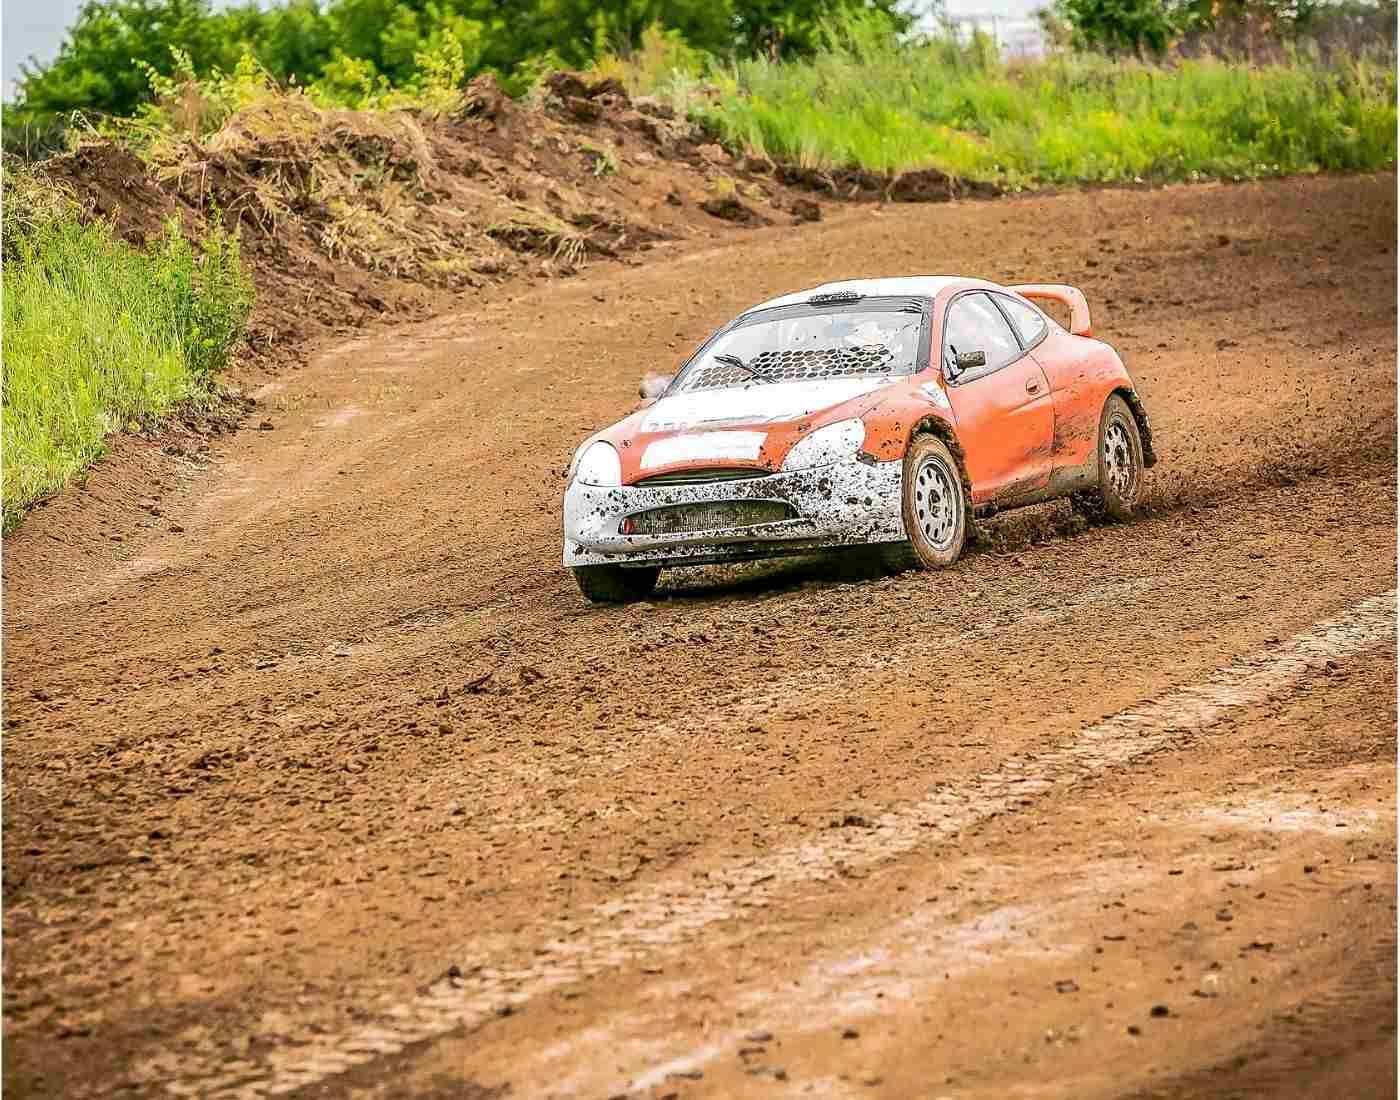 Rallying motorsport